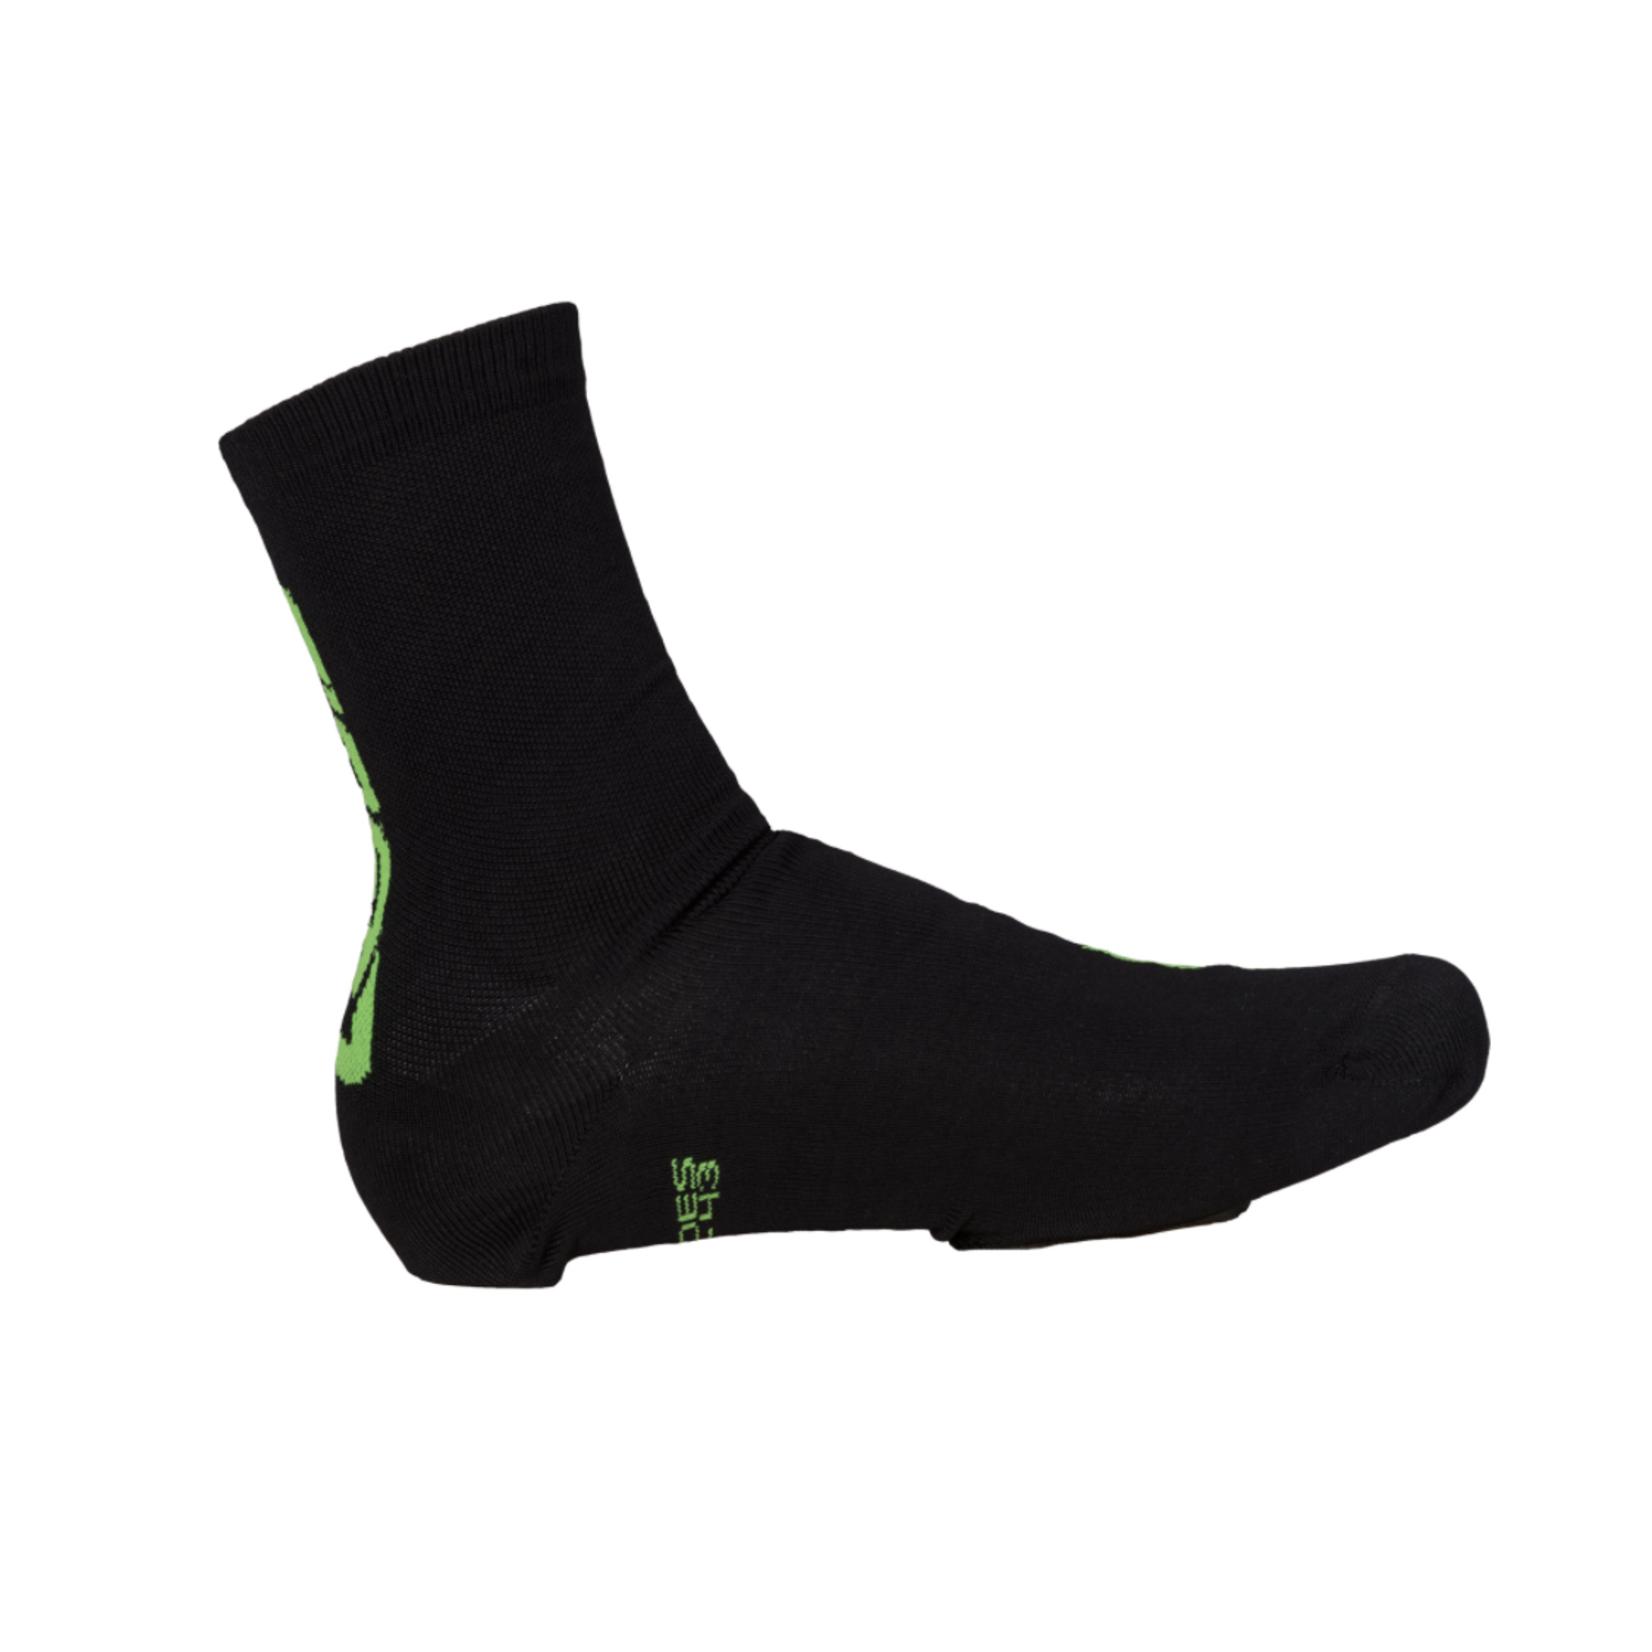 Q36.5 Q36.5 Overshoes Cordura - Black